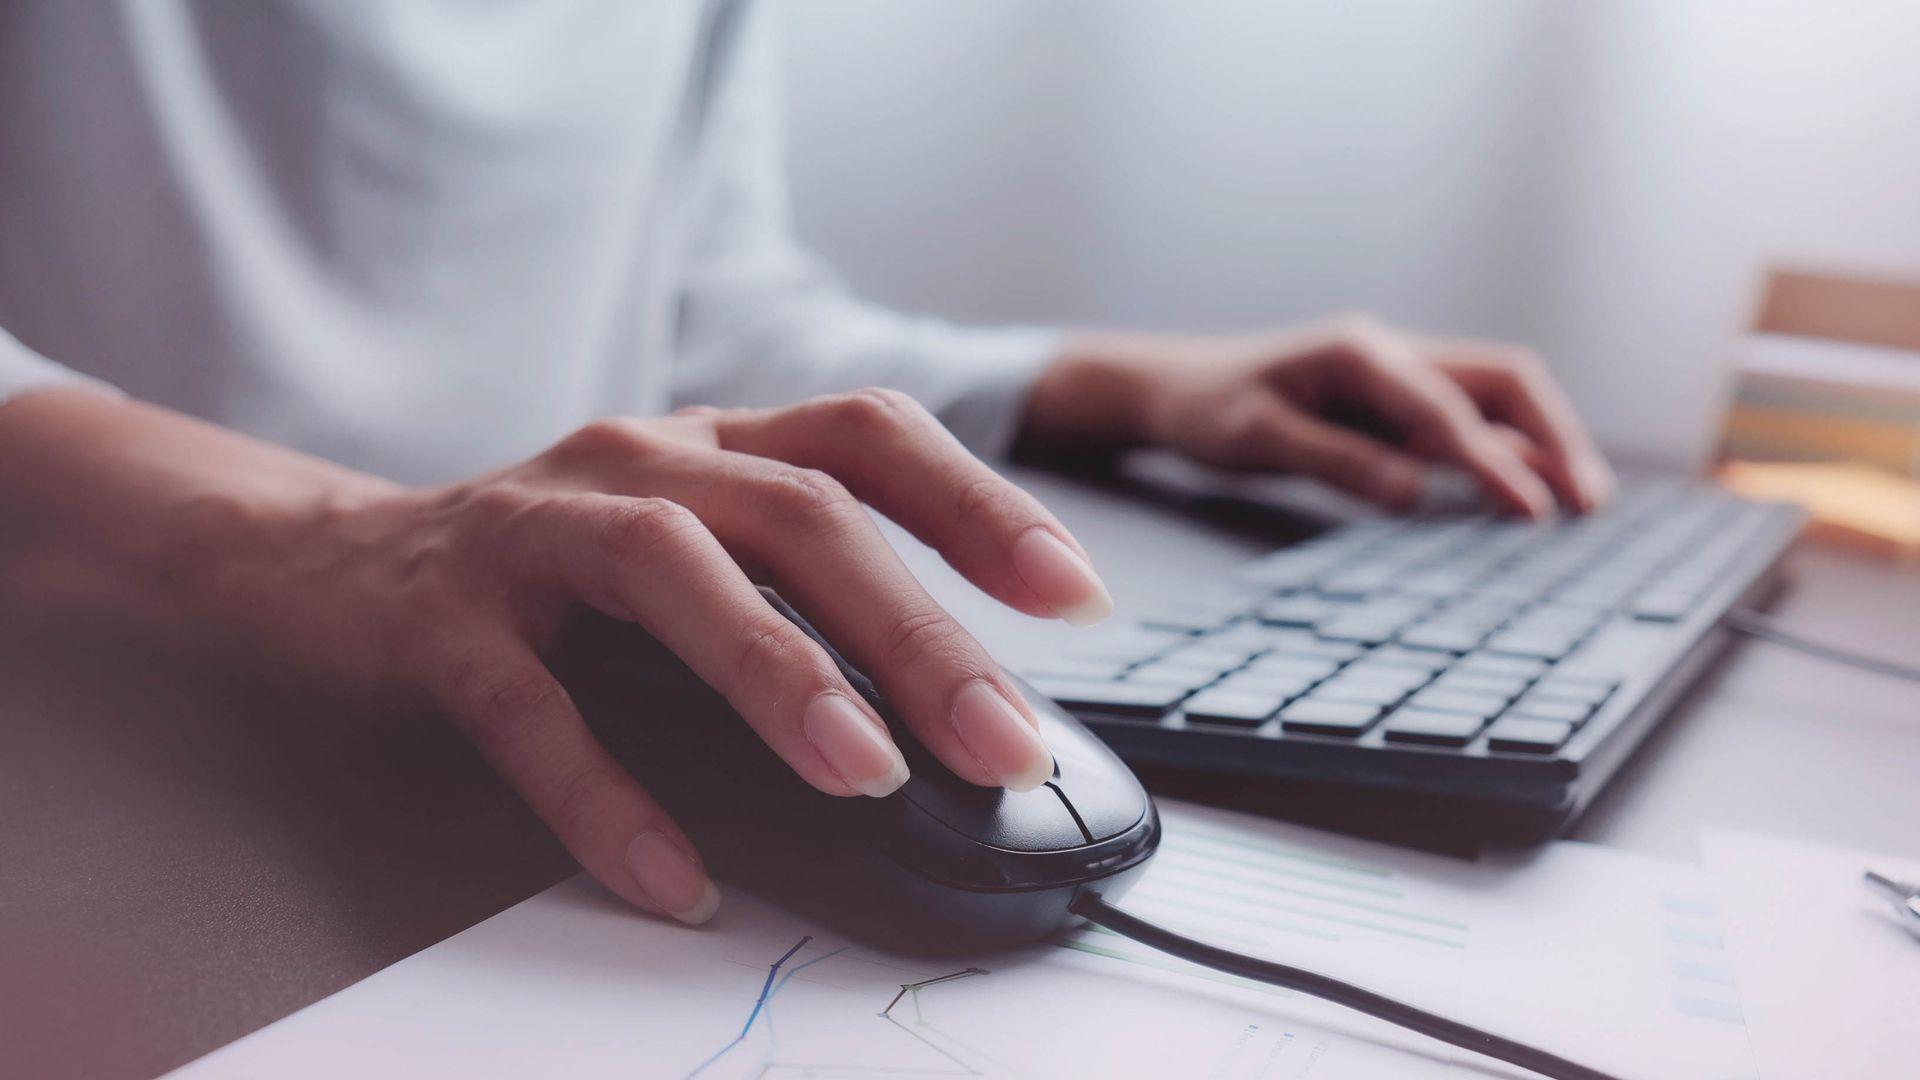 Confira a lista com os melhores combos de teclado e mouse (Foto: Ratta Lapnan/Shutterstock)